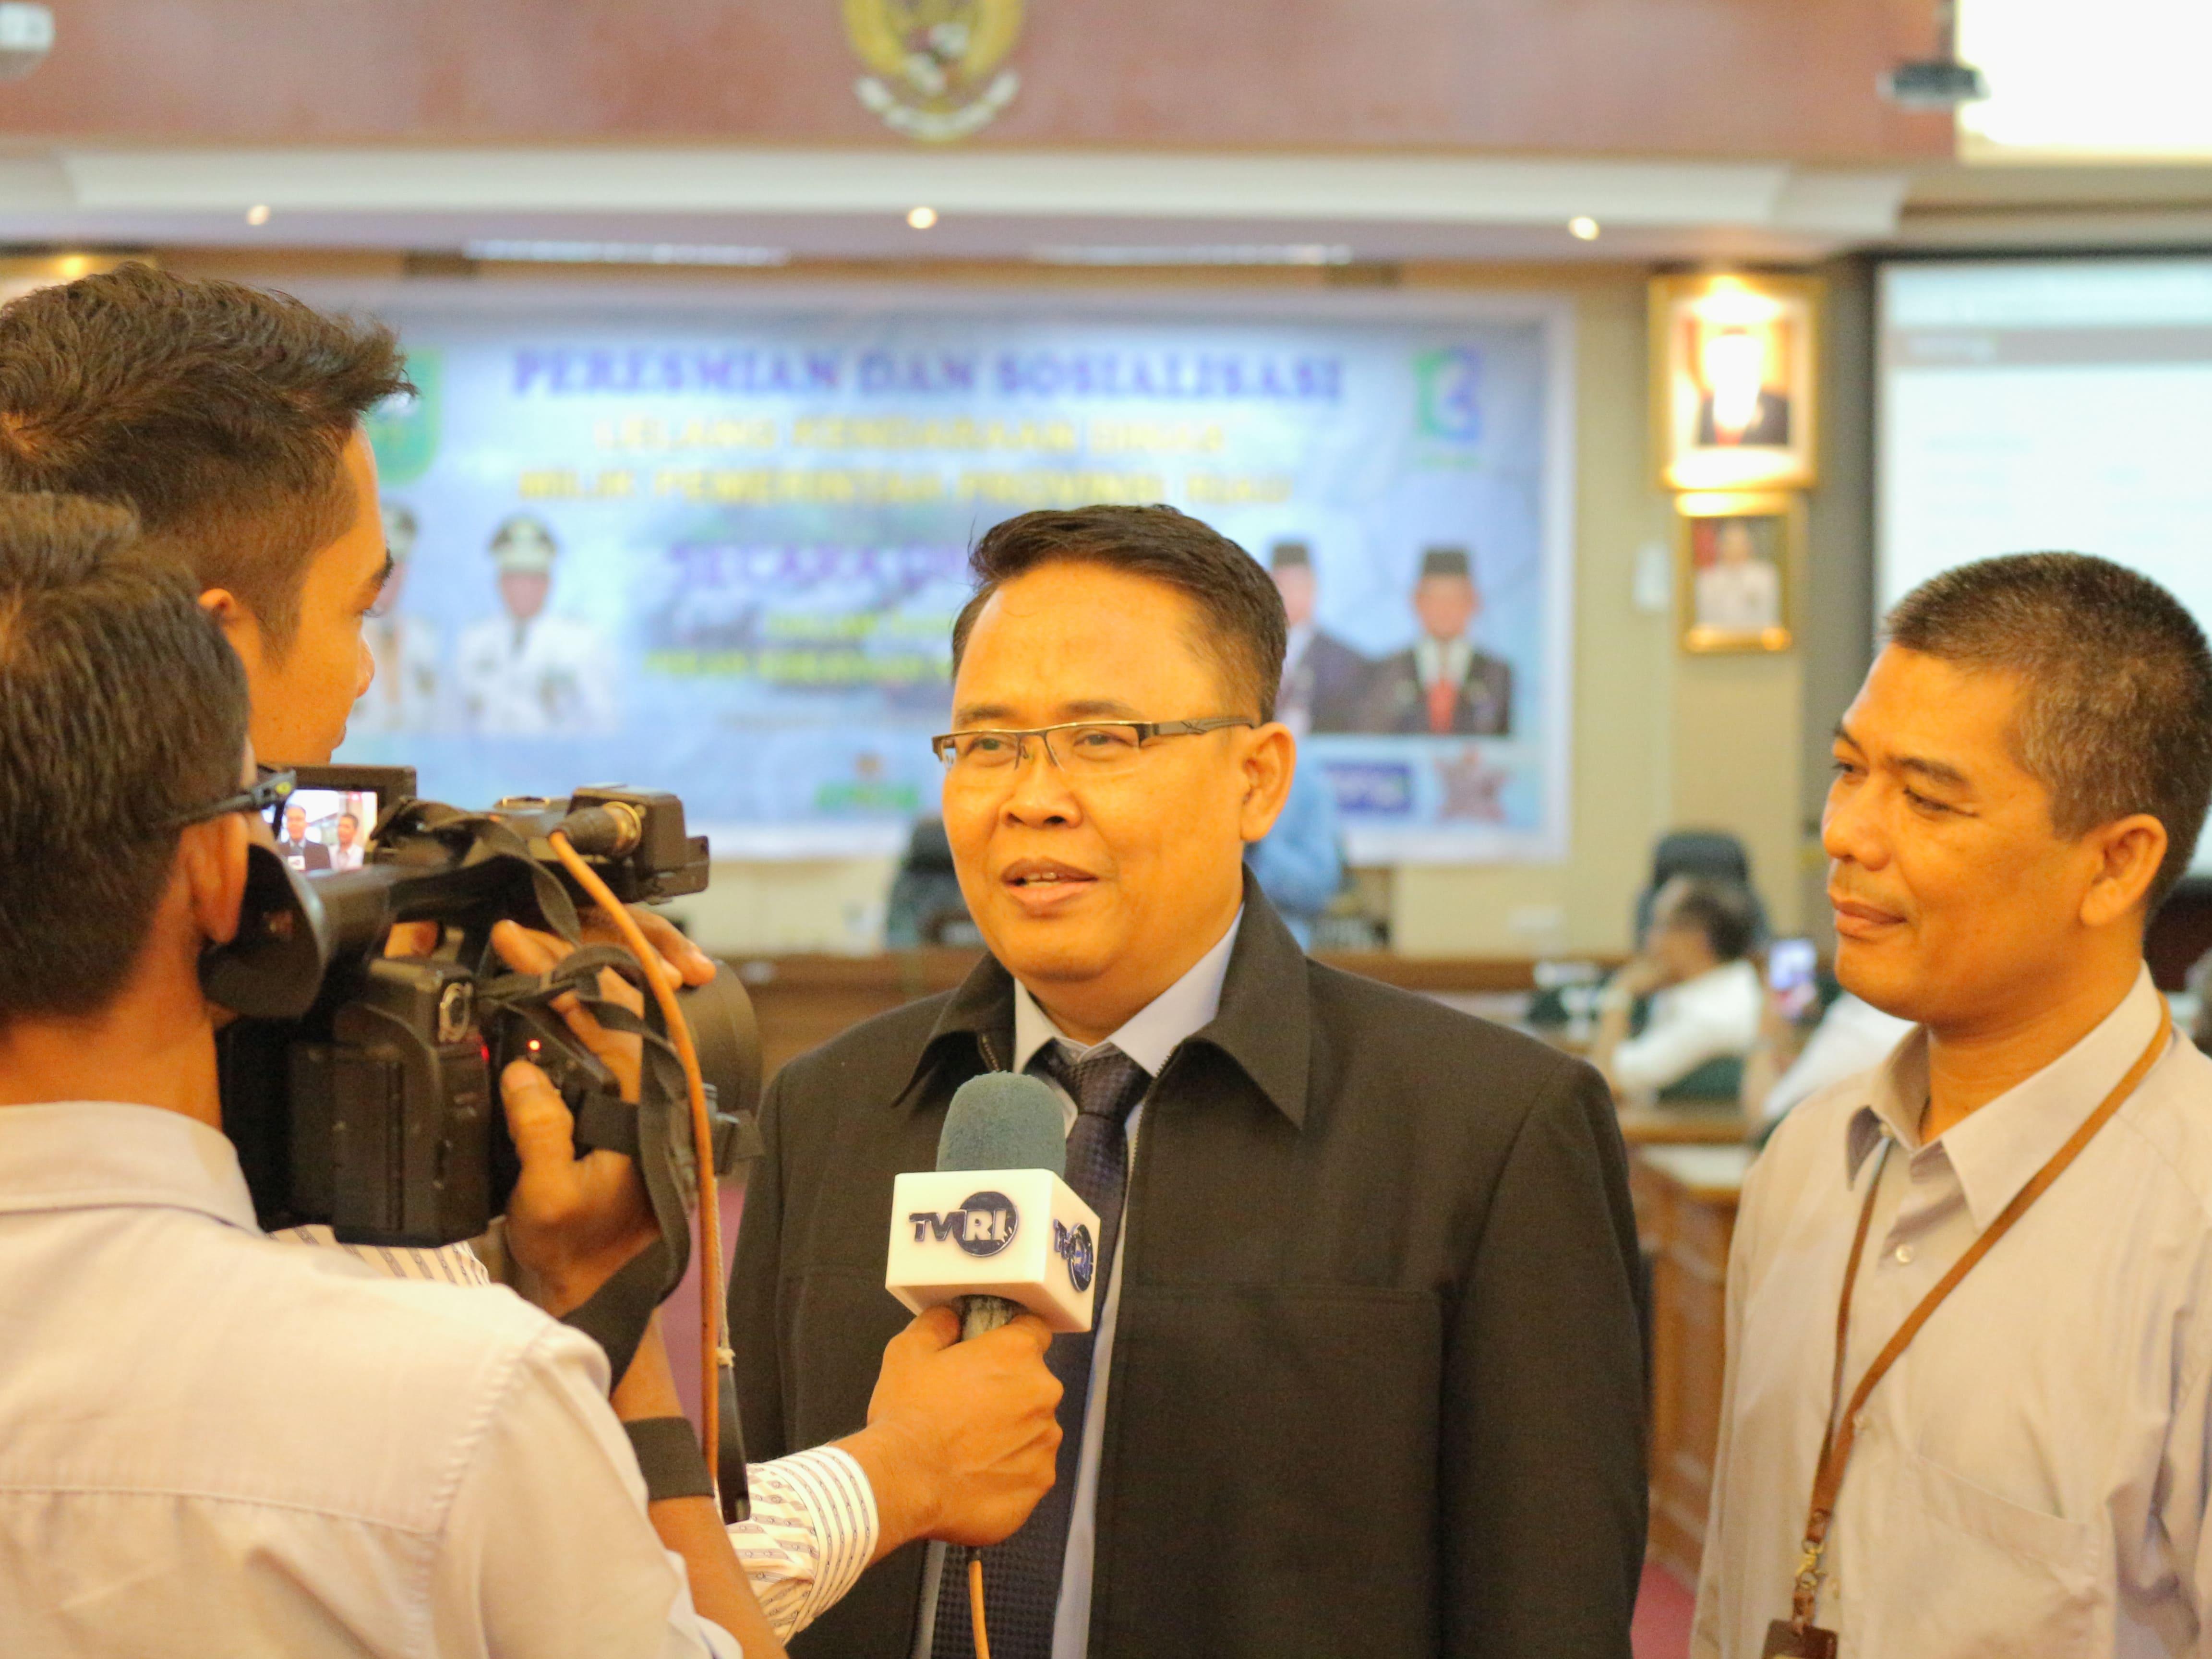 Lelang Kendaraan Operasional Perangkat Daerah (OPD) Provinsi Riau